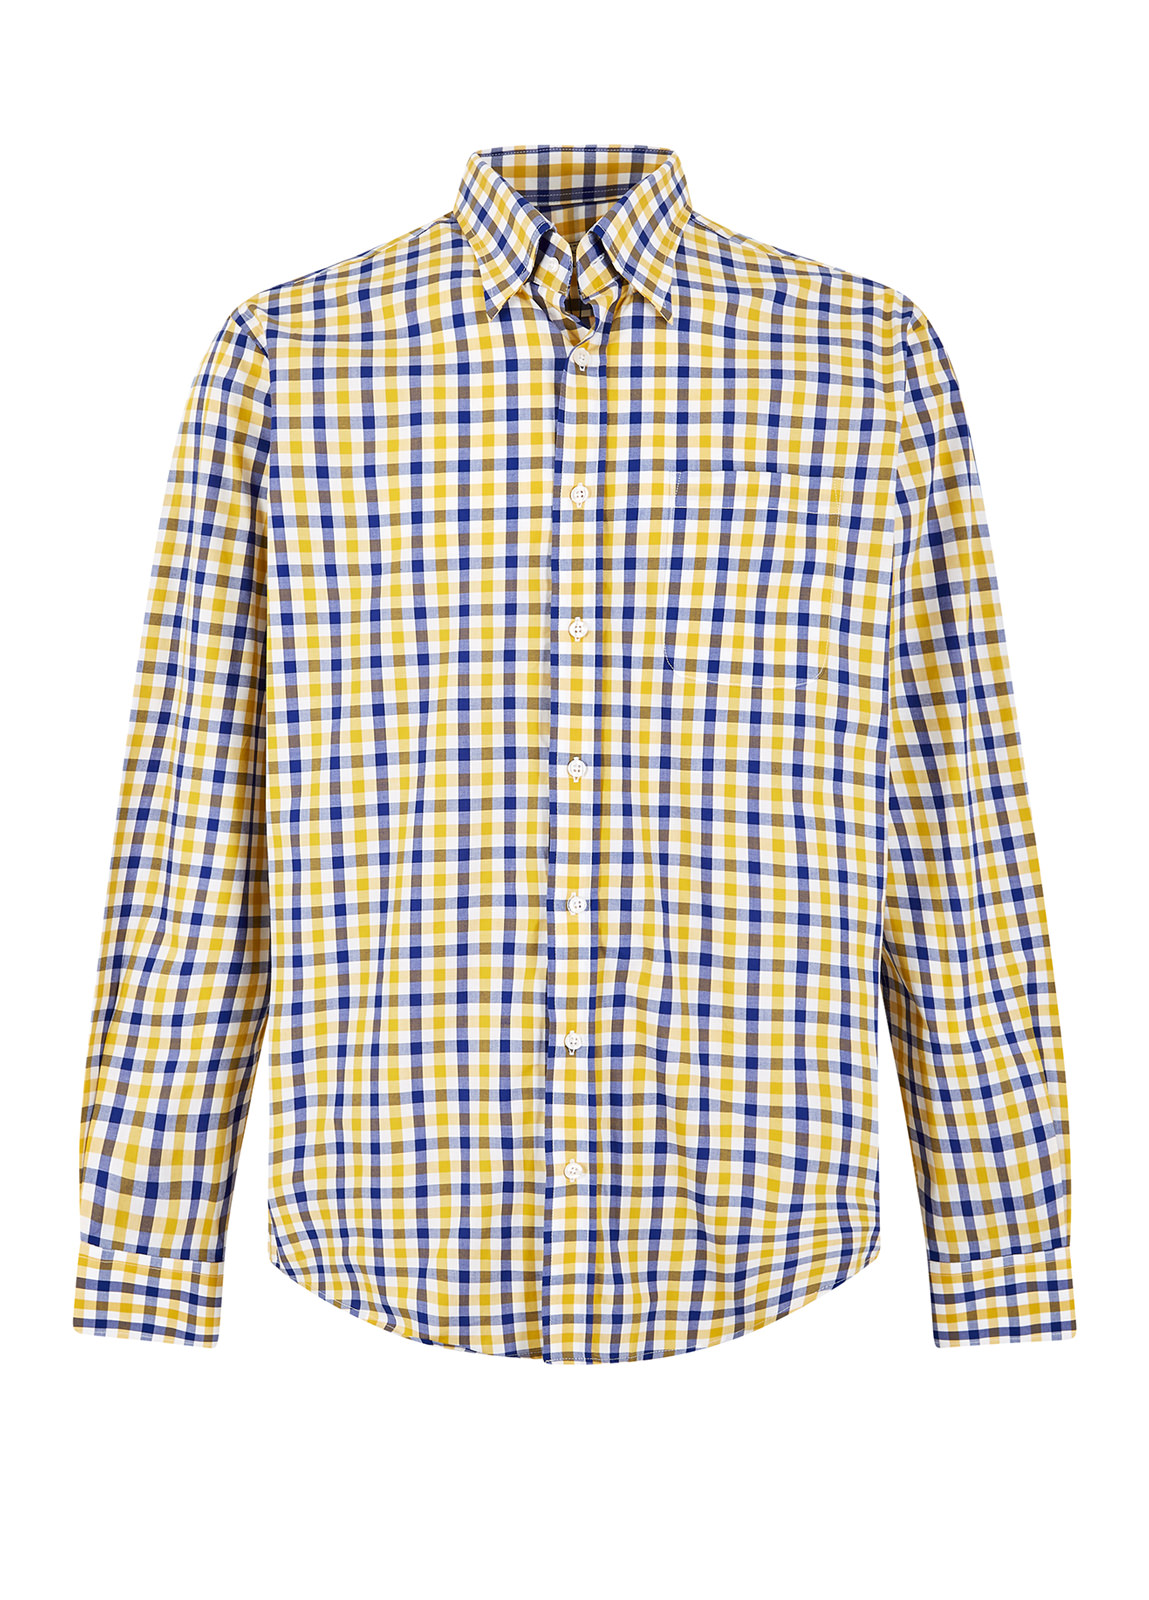 Dubarry_Coachford Shirt - Sunflower_Image_2